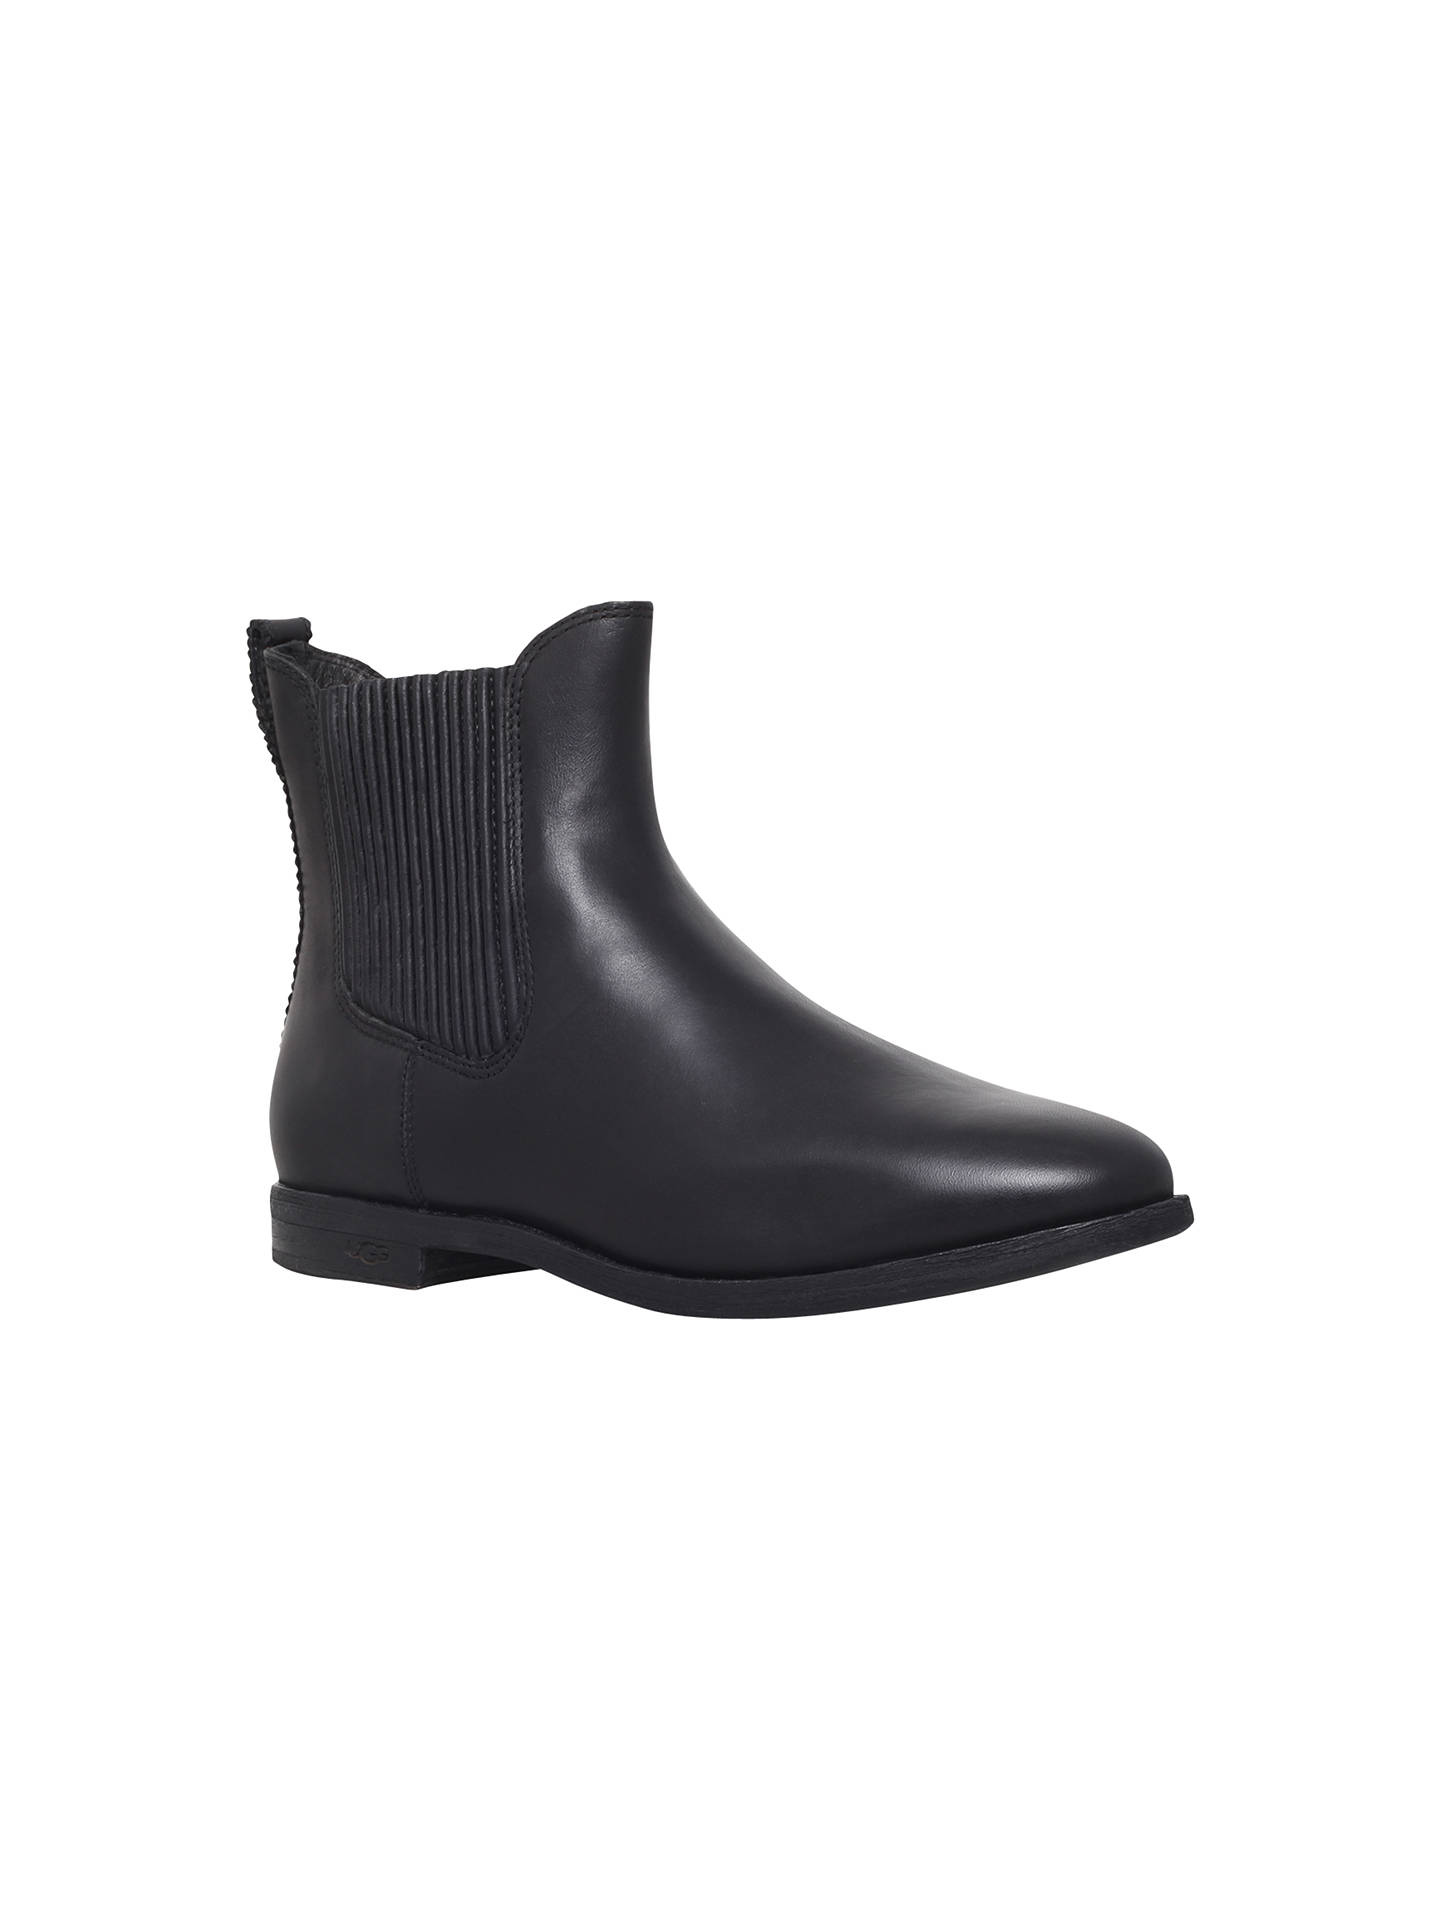 0555ba62817 UGG Joey Women's Chelsea Boots at John Lewis & Partners